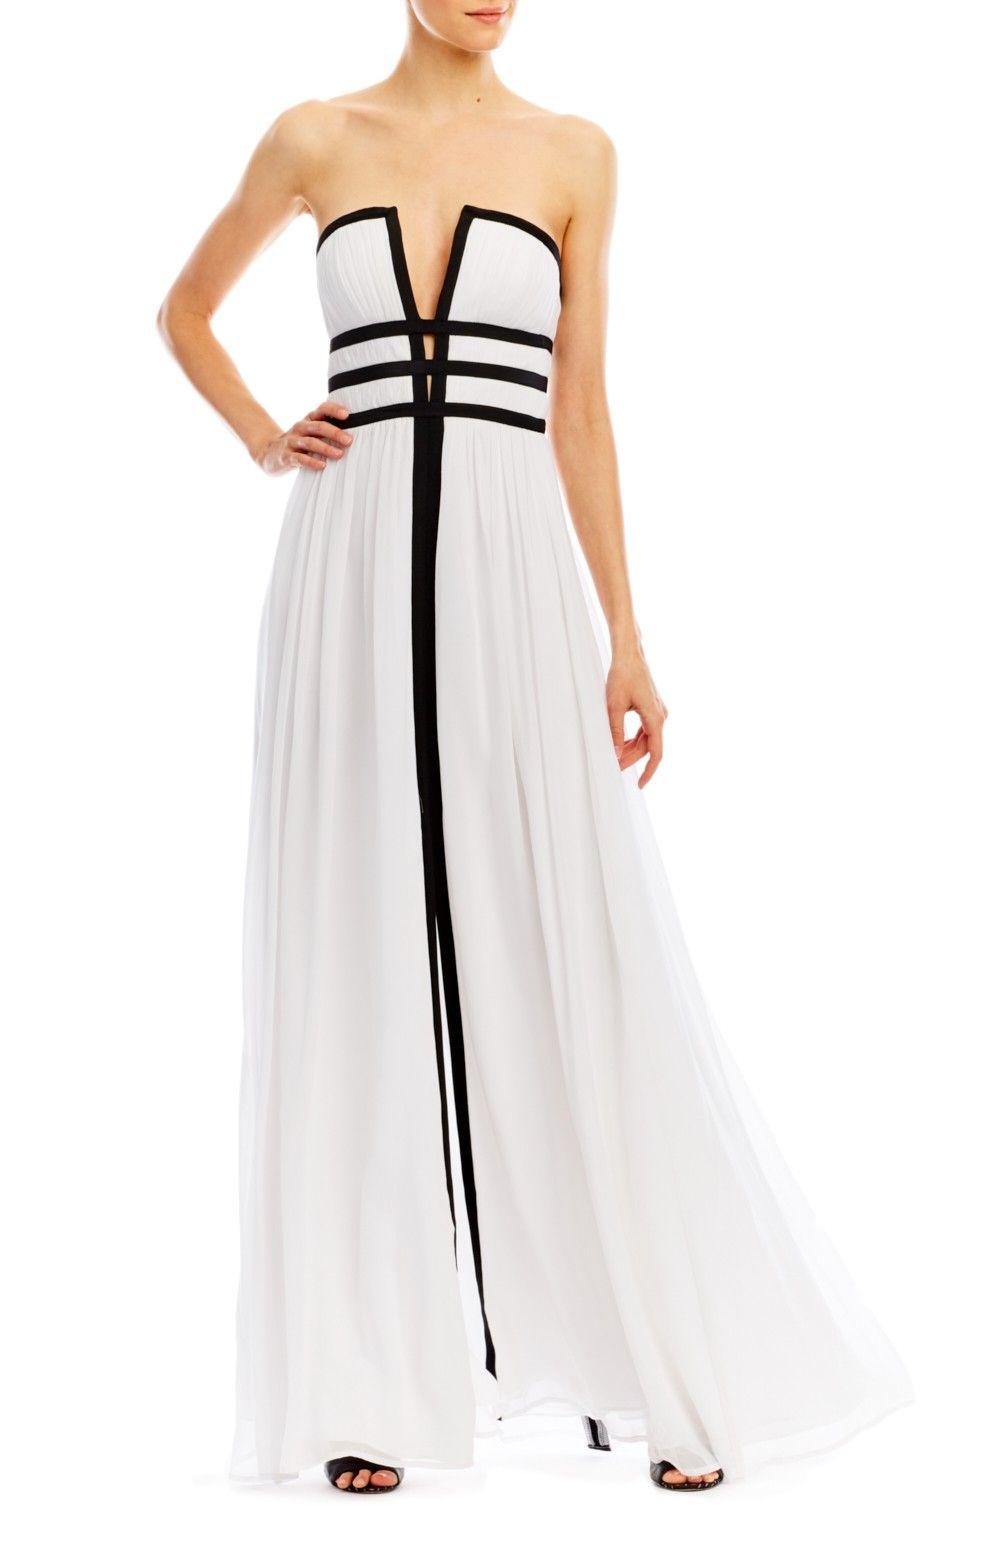 Chic & Contemporary Dresses